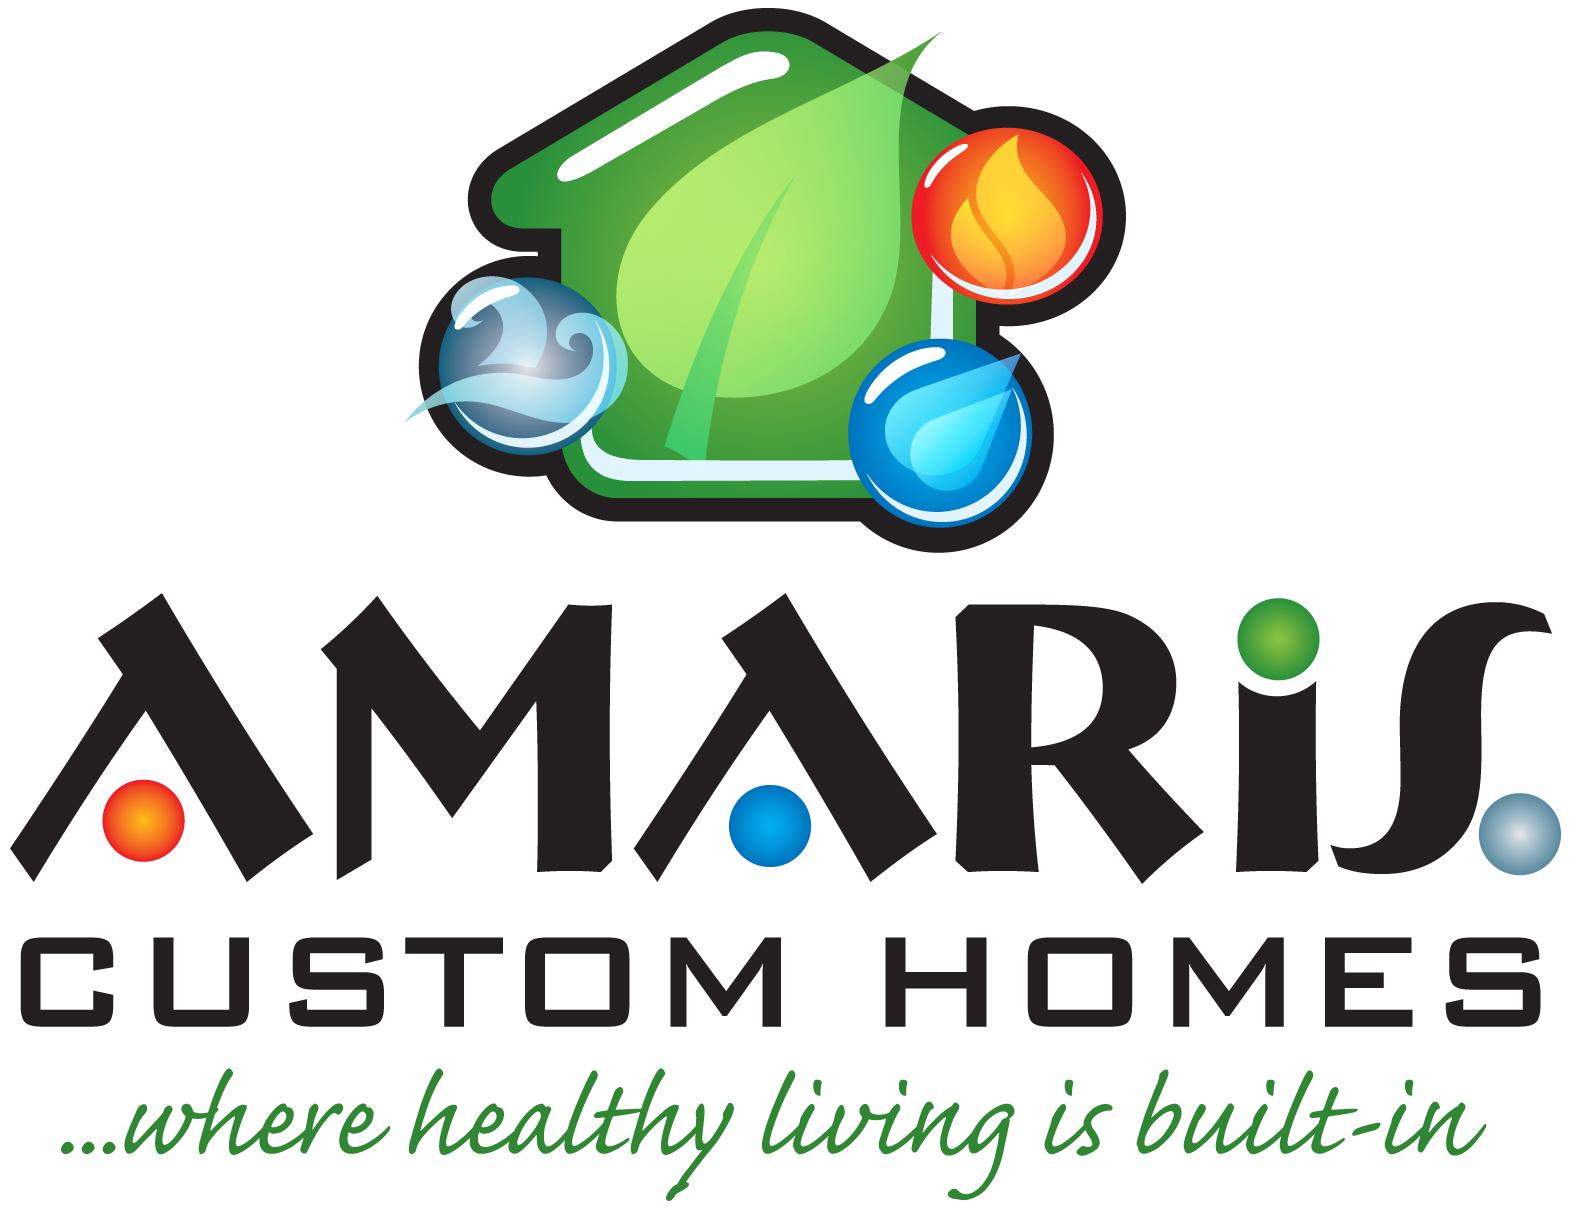 Amaris Homes, LLC company logo